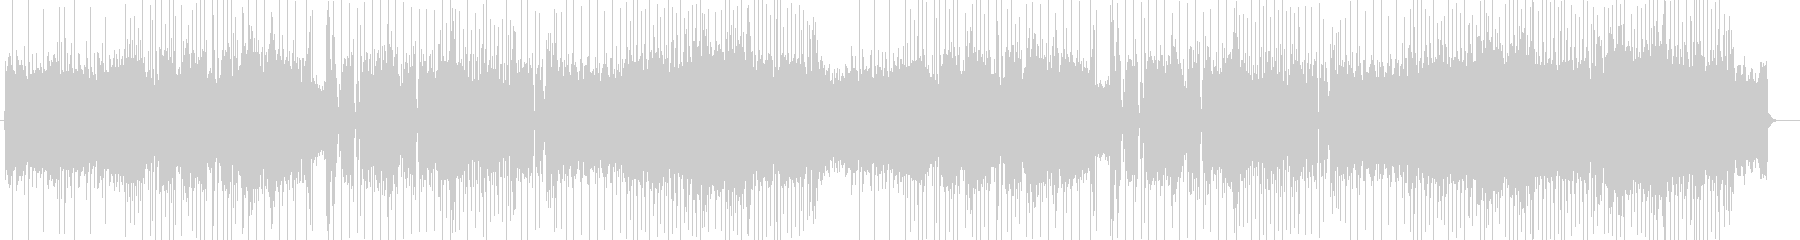 「HR/HM」「ROCK」BGM274の未再生の波形